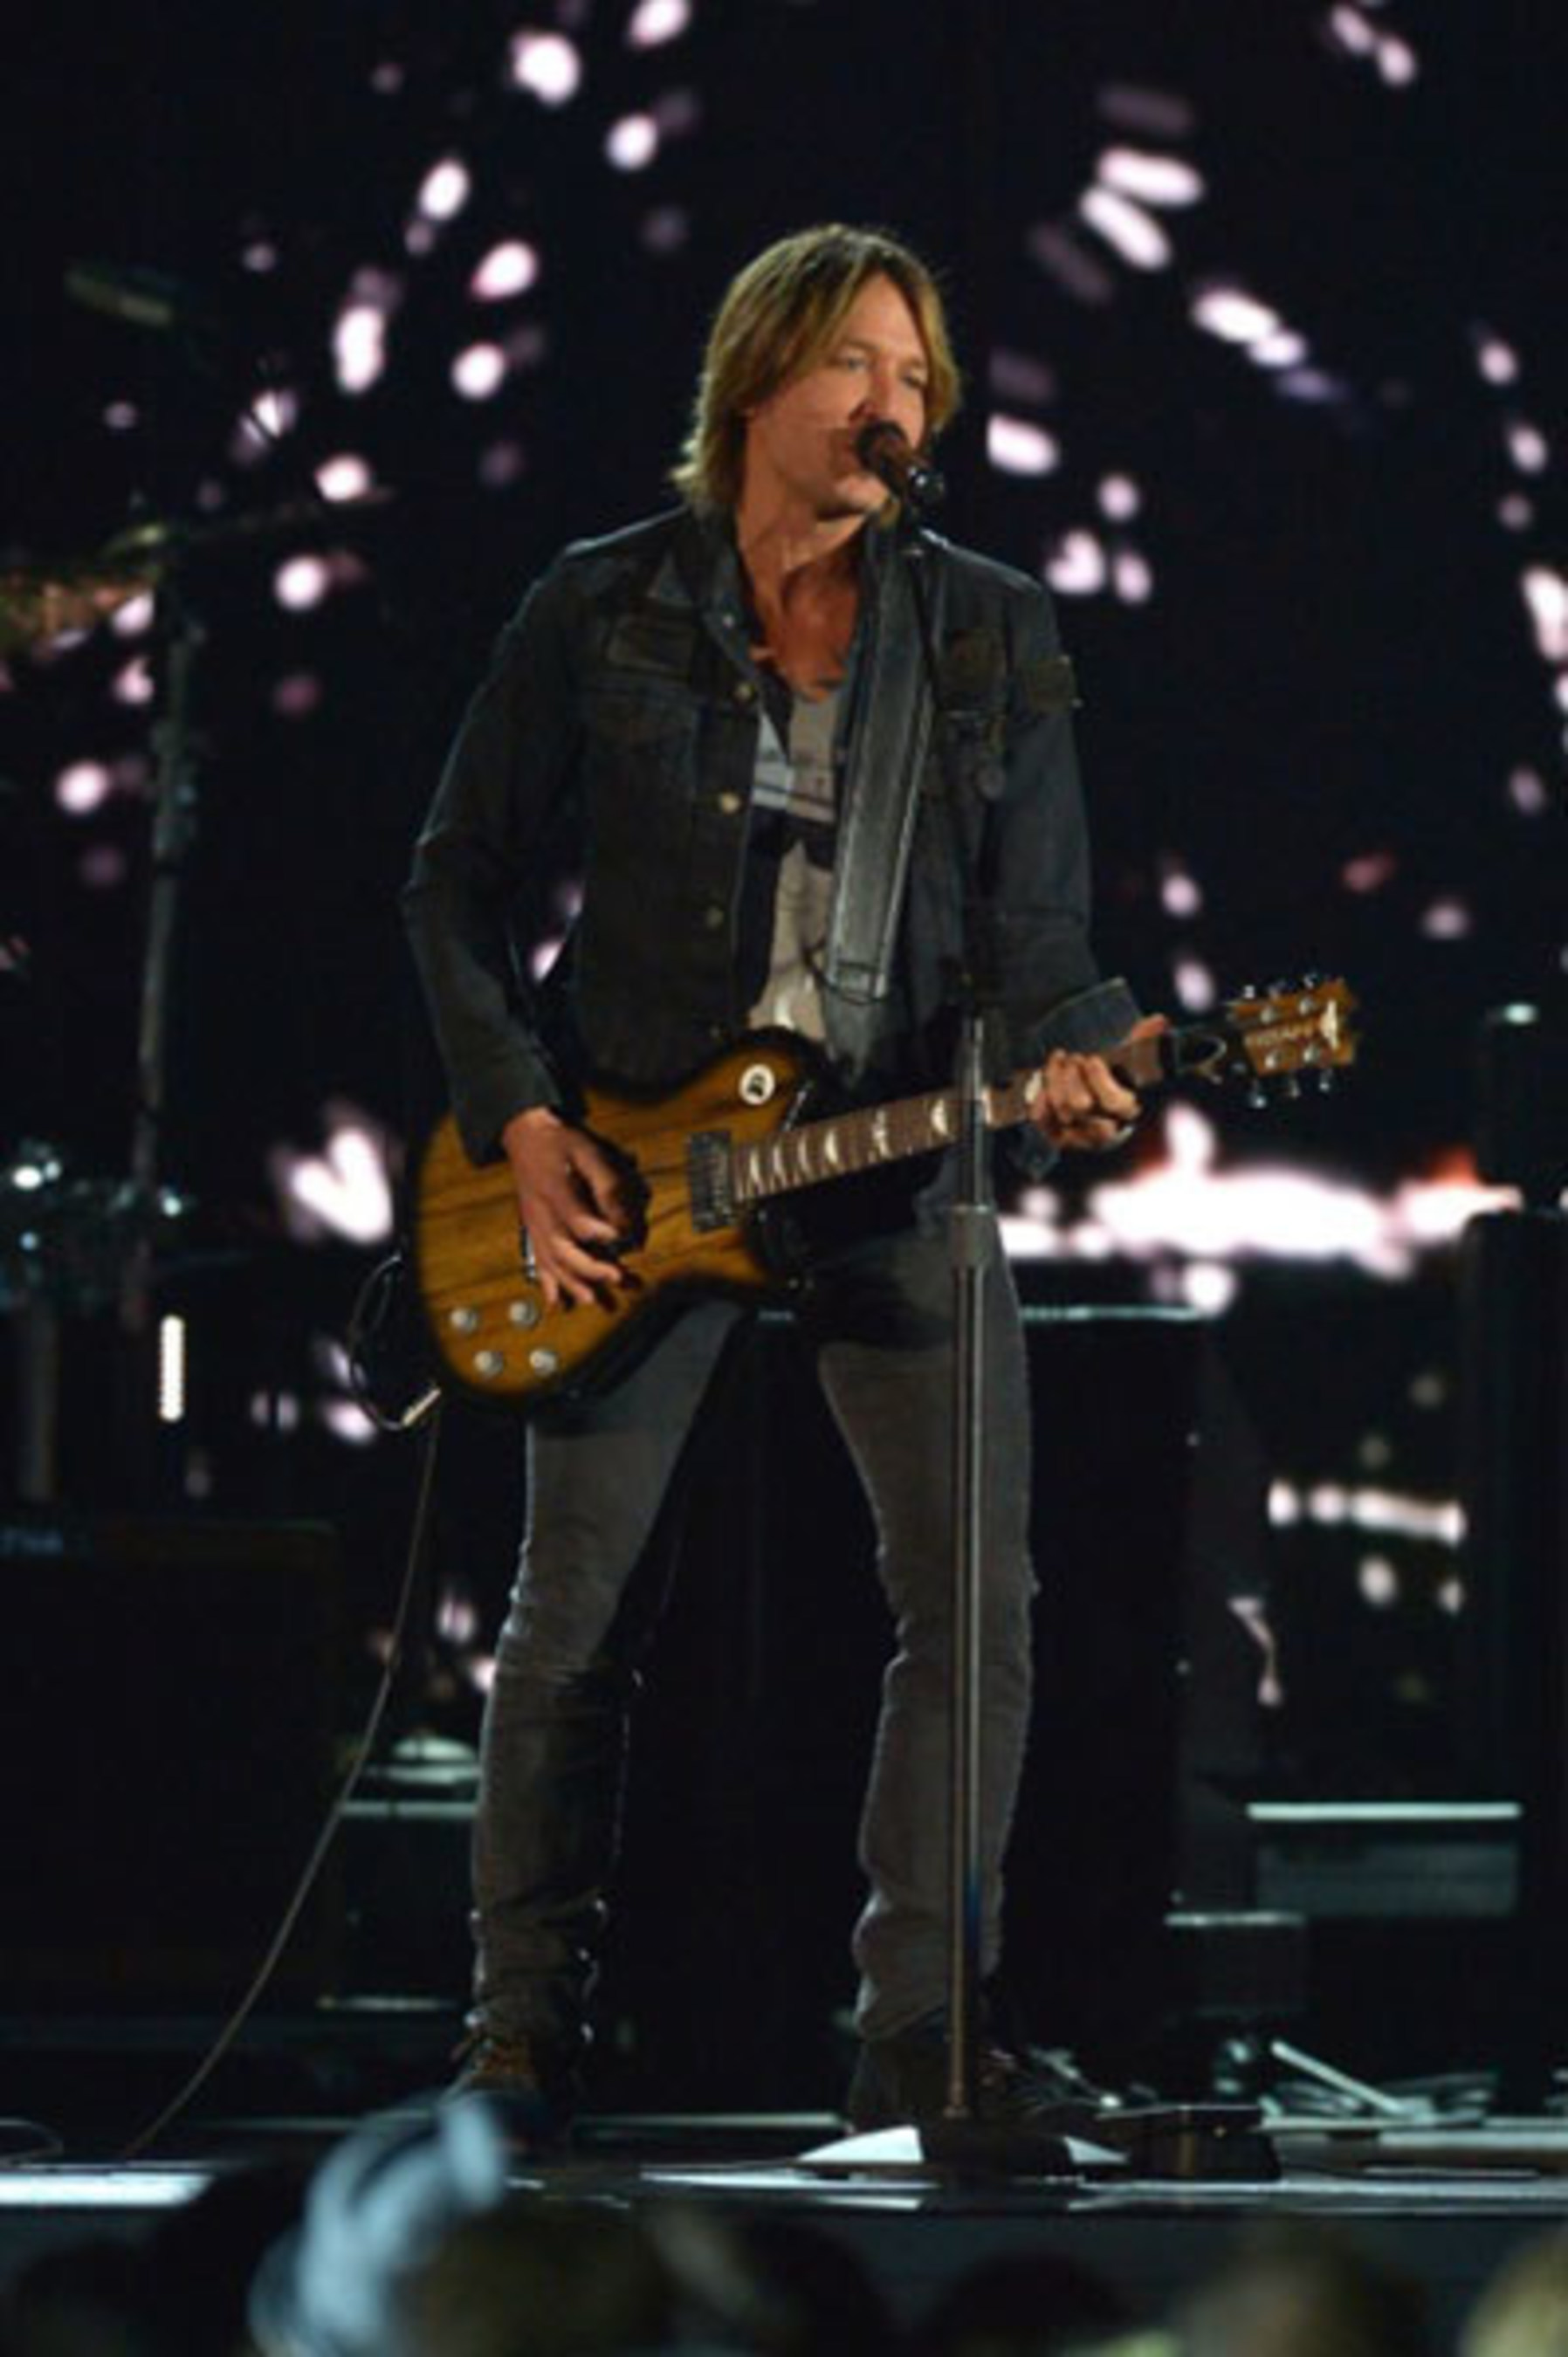 Four Time Grammy Award Winner Keith Urban Returns To Hsn For 1st